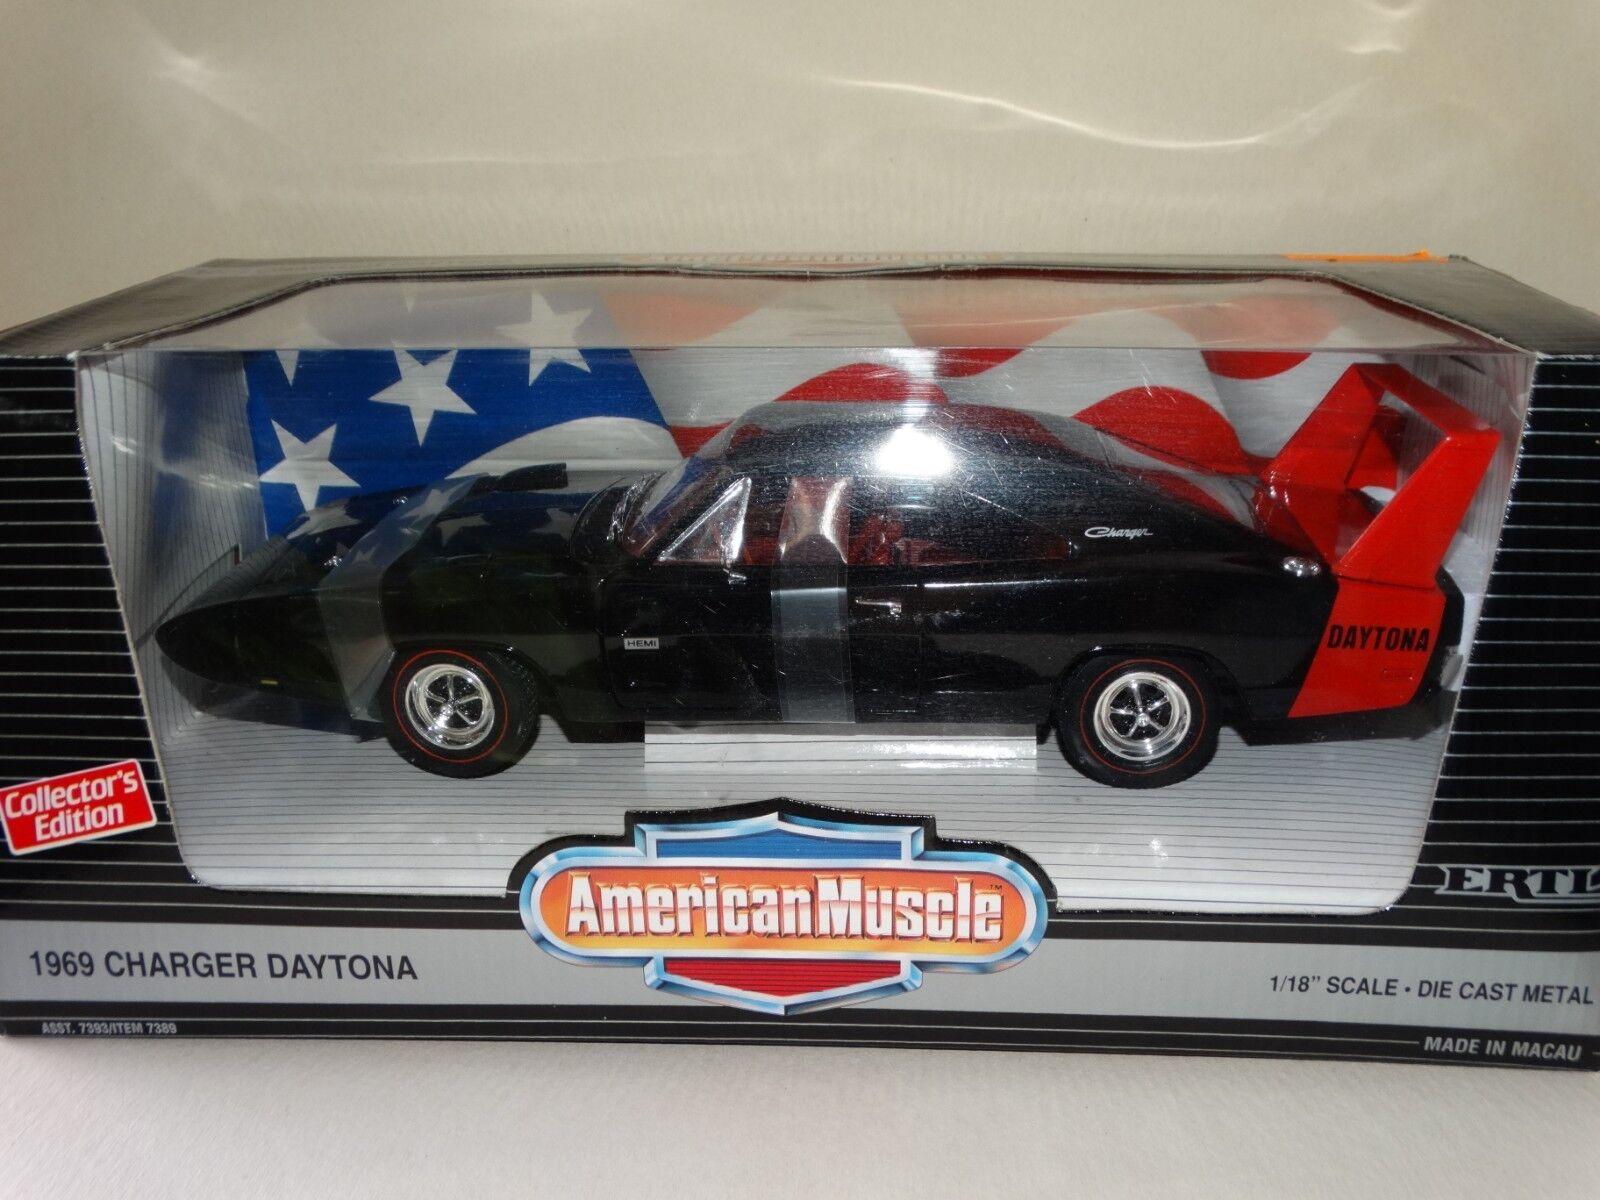 Ertl 1969 Dodge Charger Daytona Mopar 1 18 Scale Diecast American Muscle voiture Blk